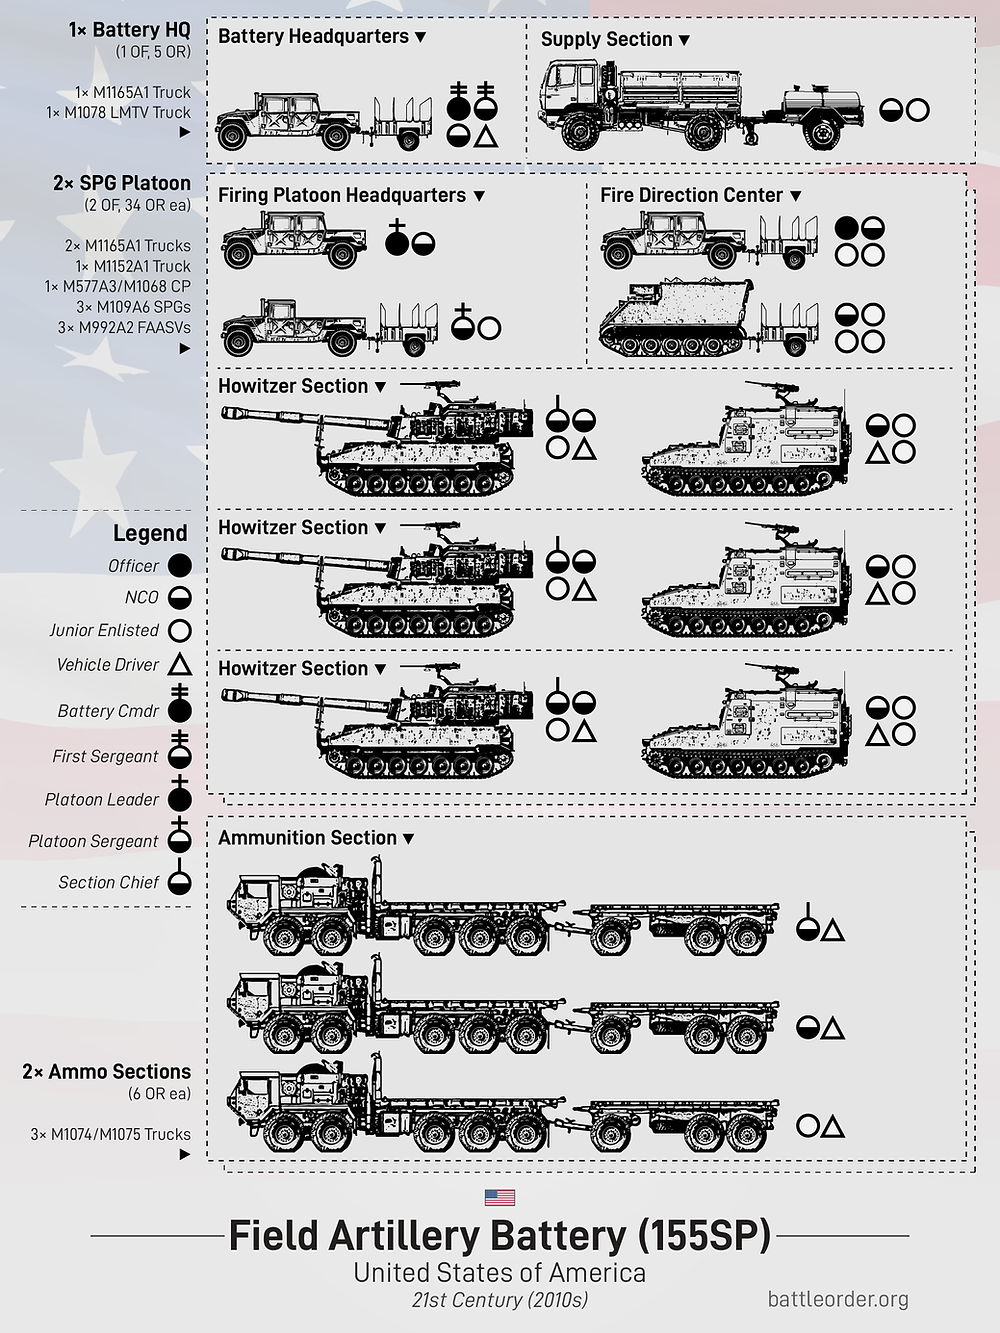 Field Artillery Battery (155SP) organization